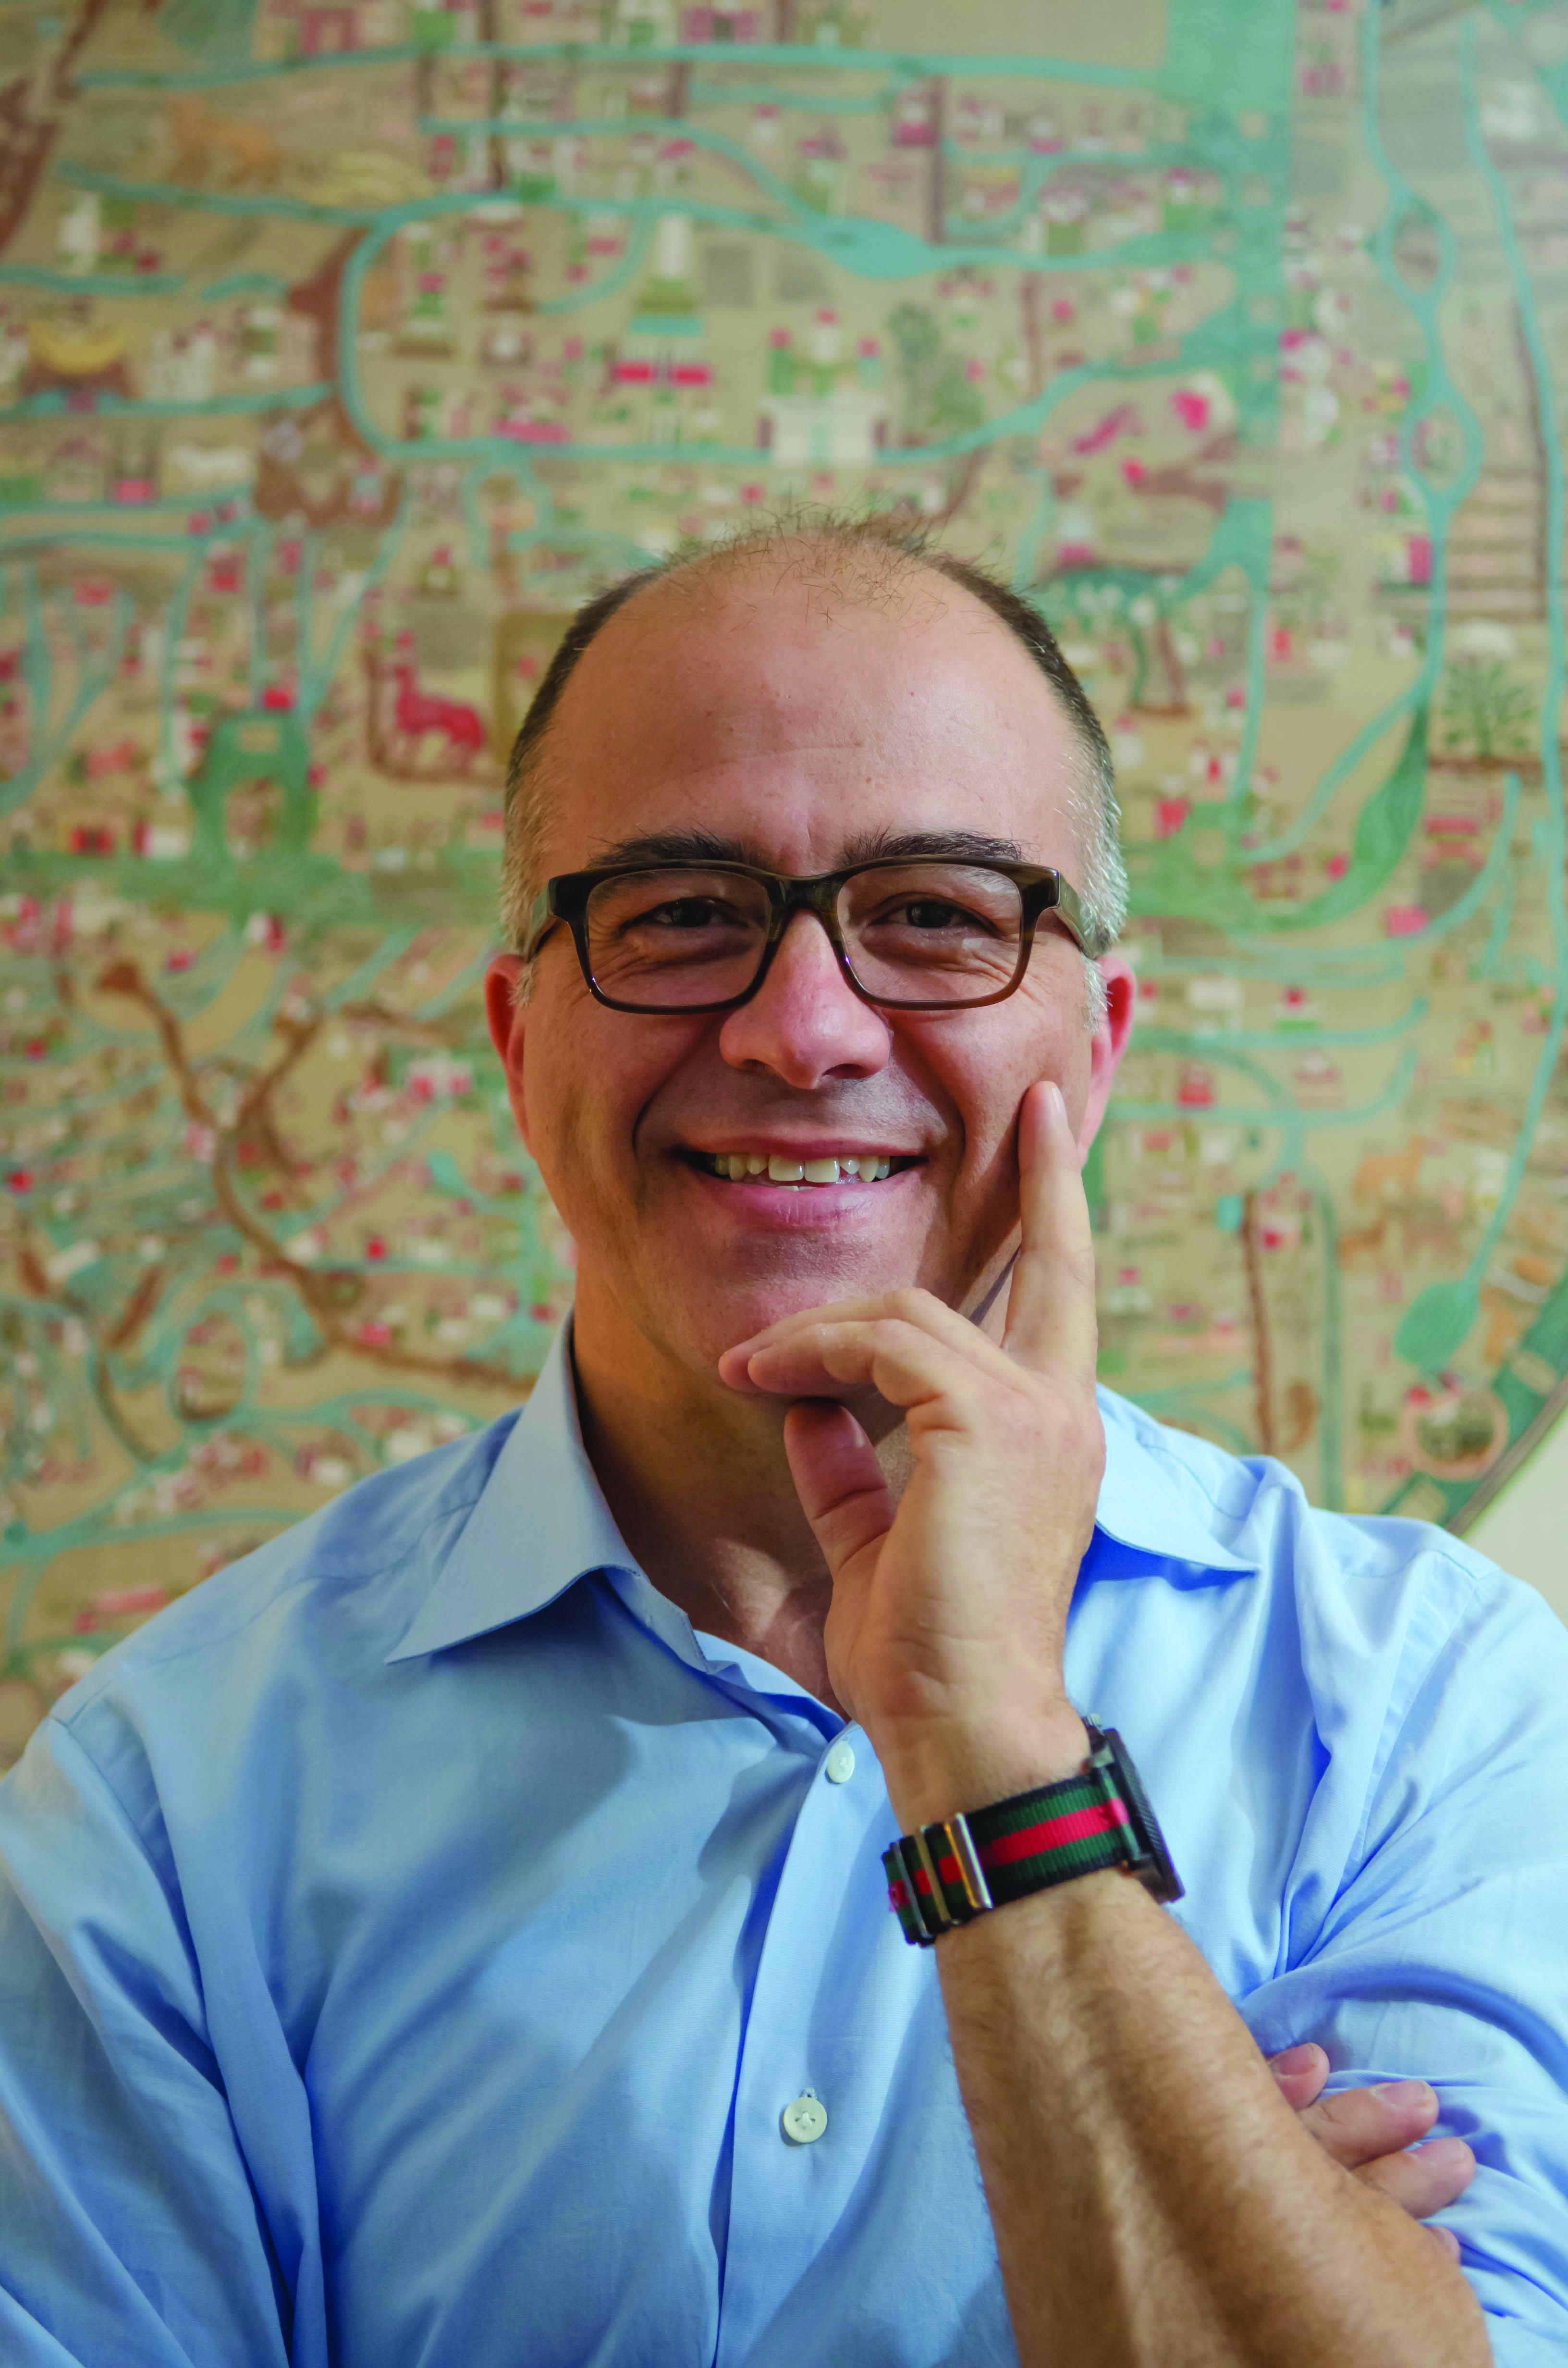 Nico Wey-Gomez, professor of history